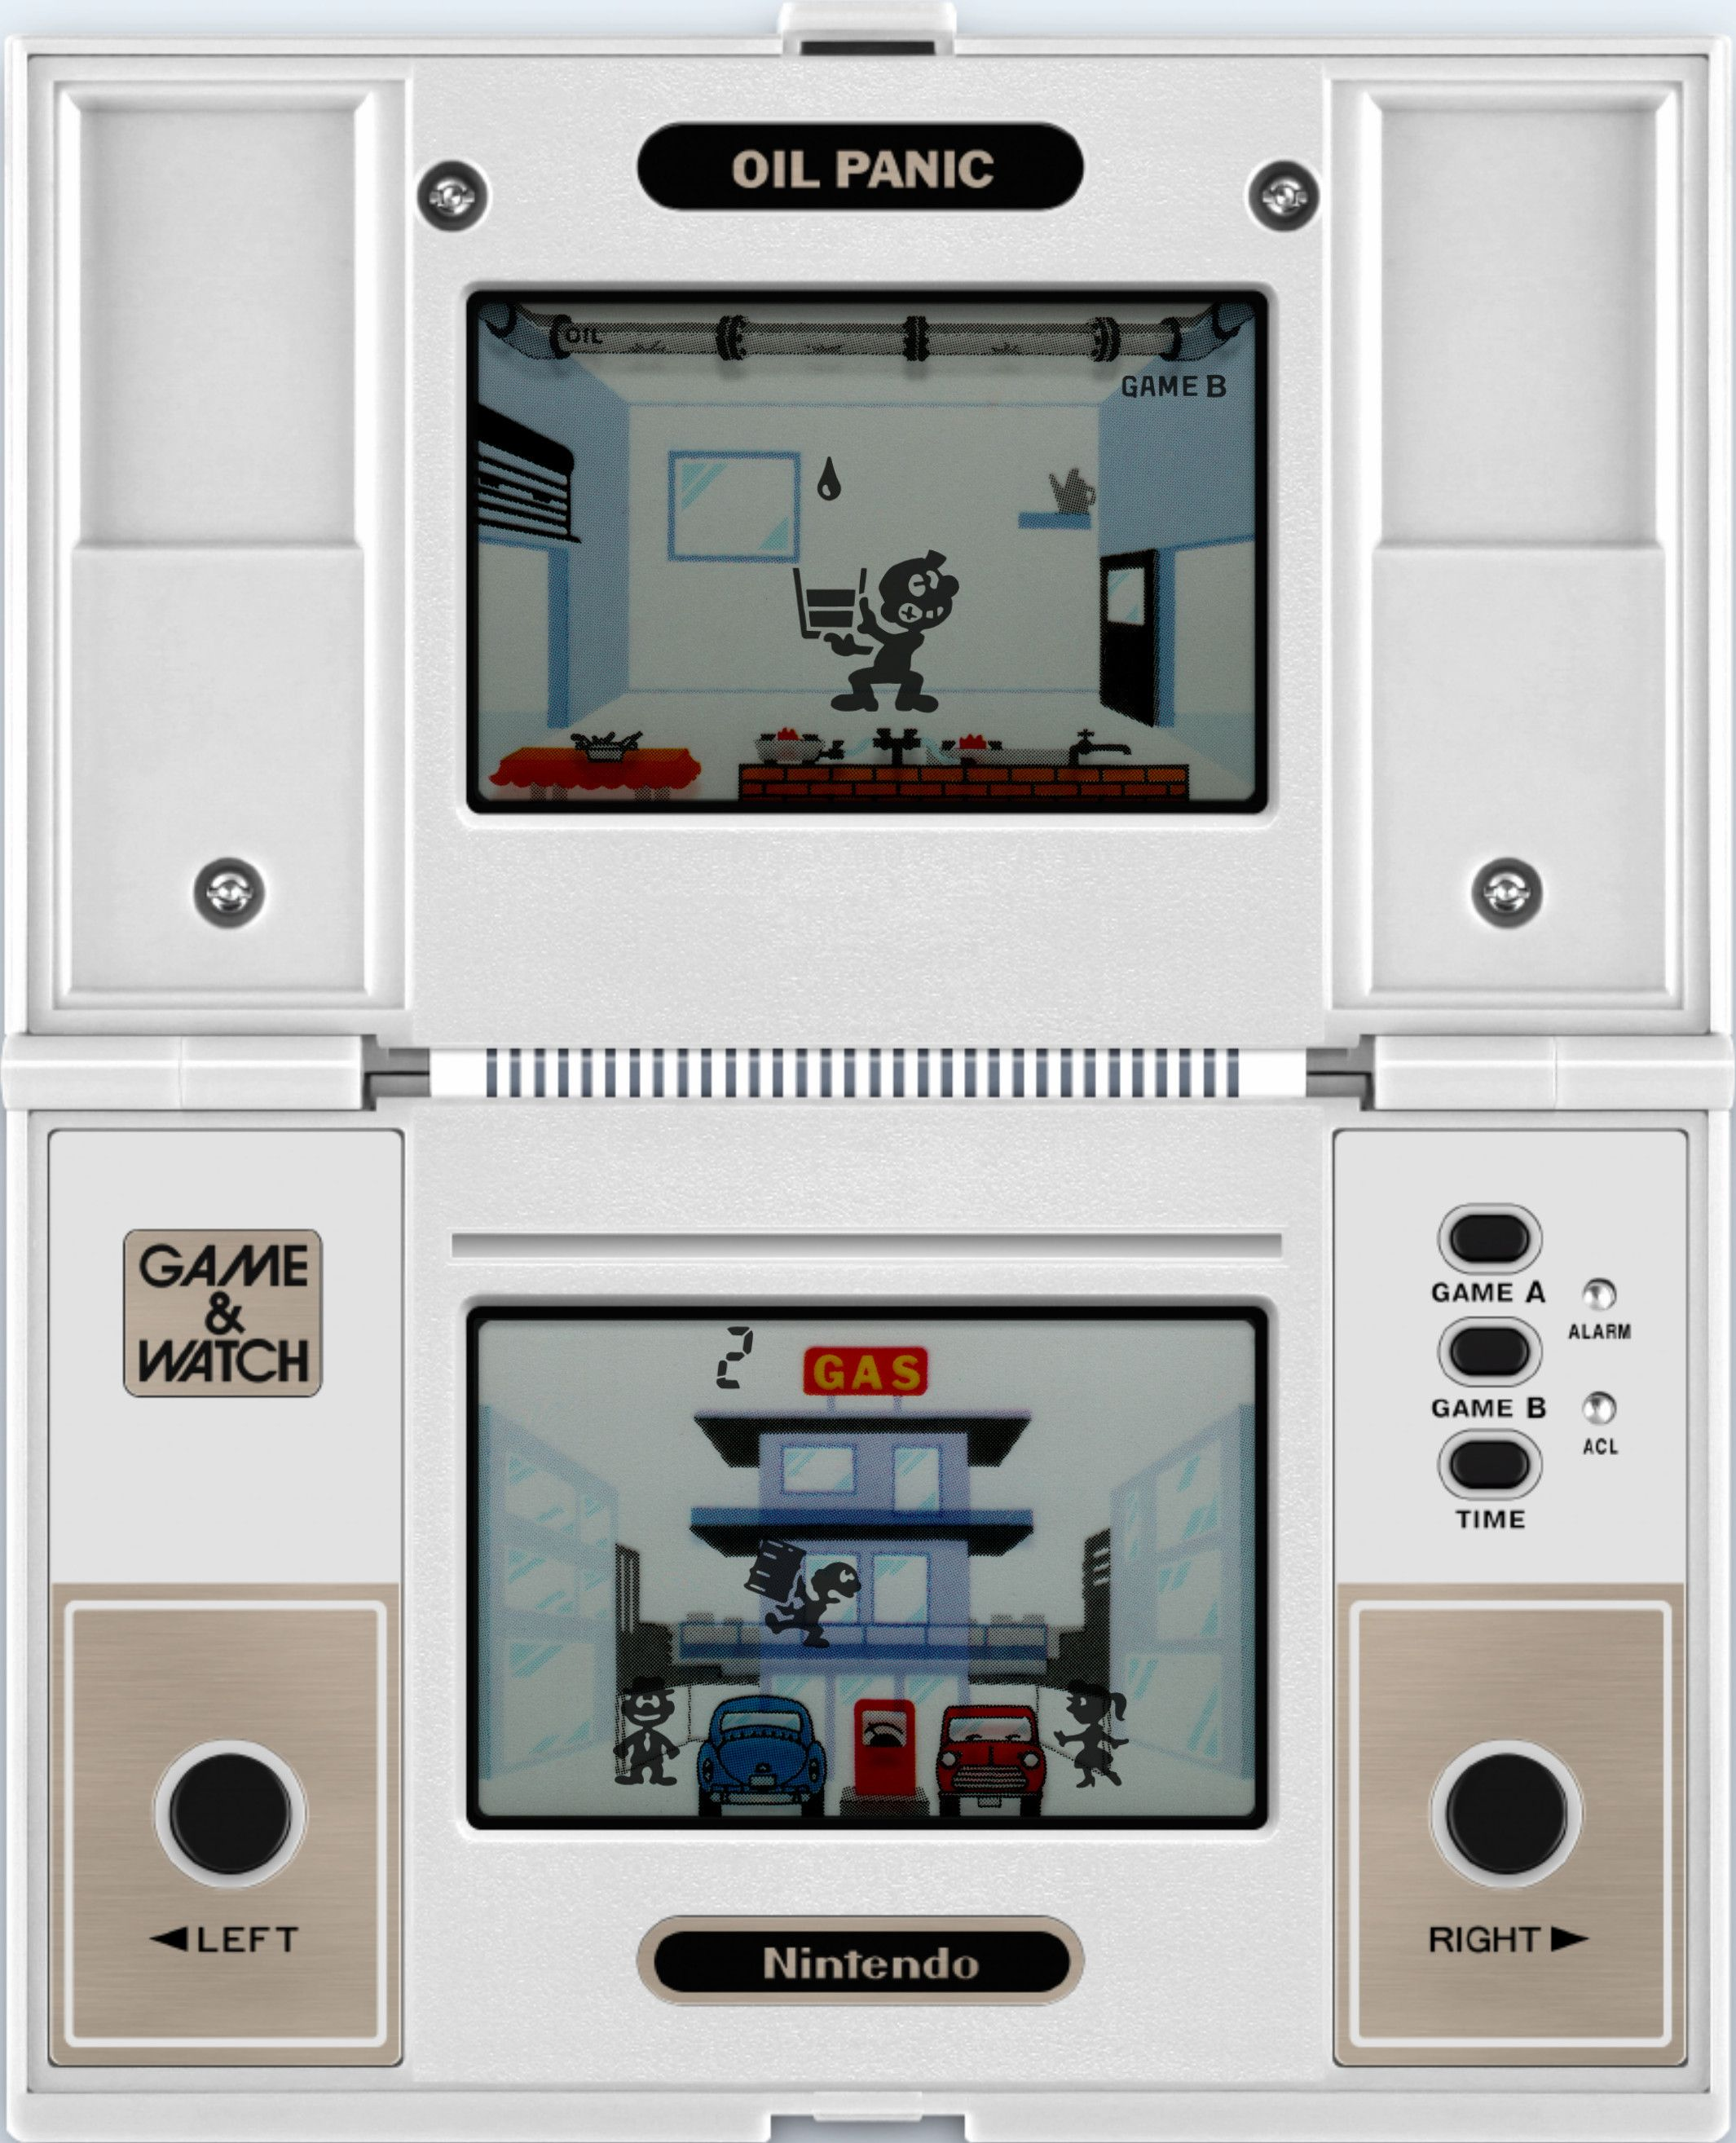 972684-game-watch-multi-screen-oil-panic-dedicated-handheld-screenshot.jpg